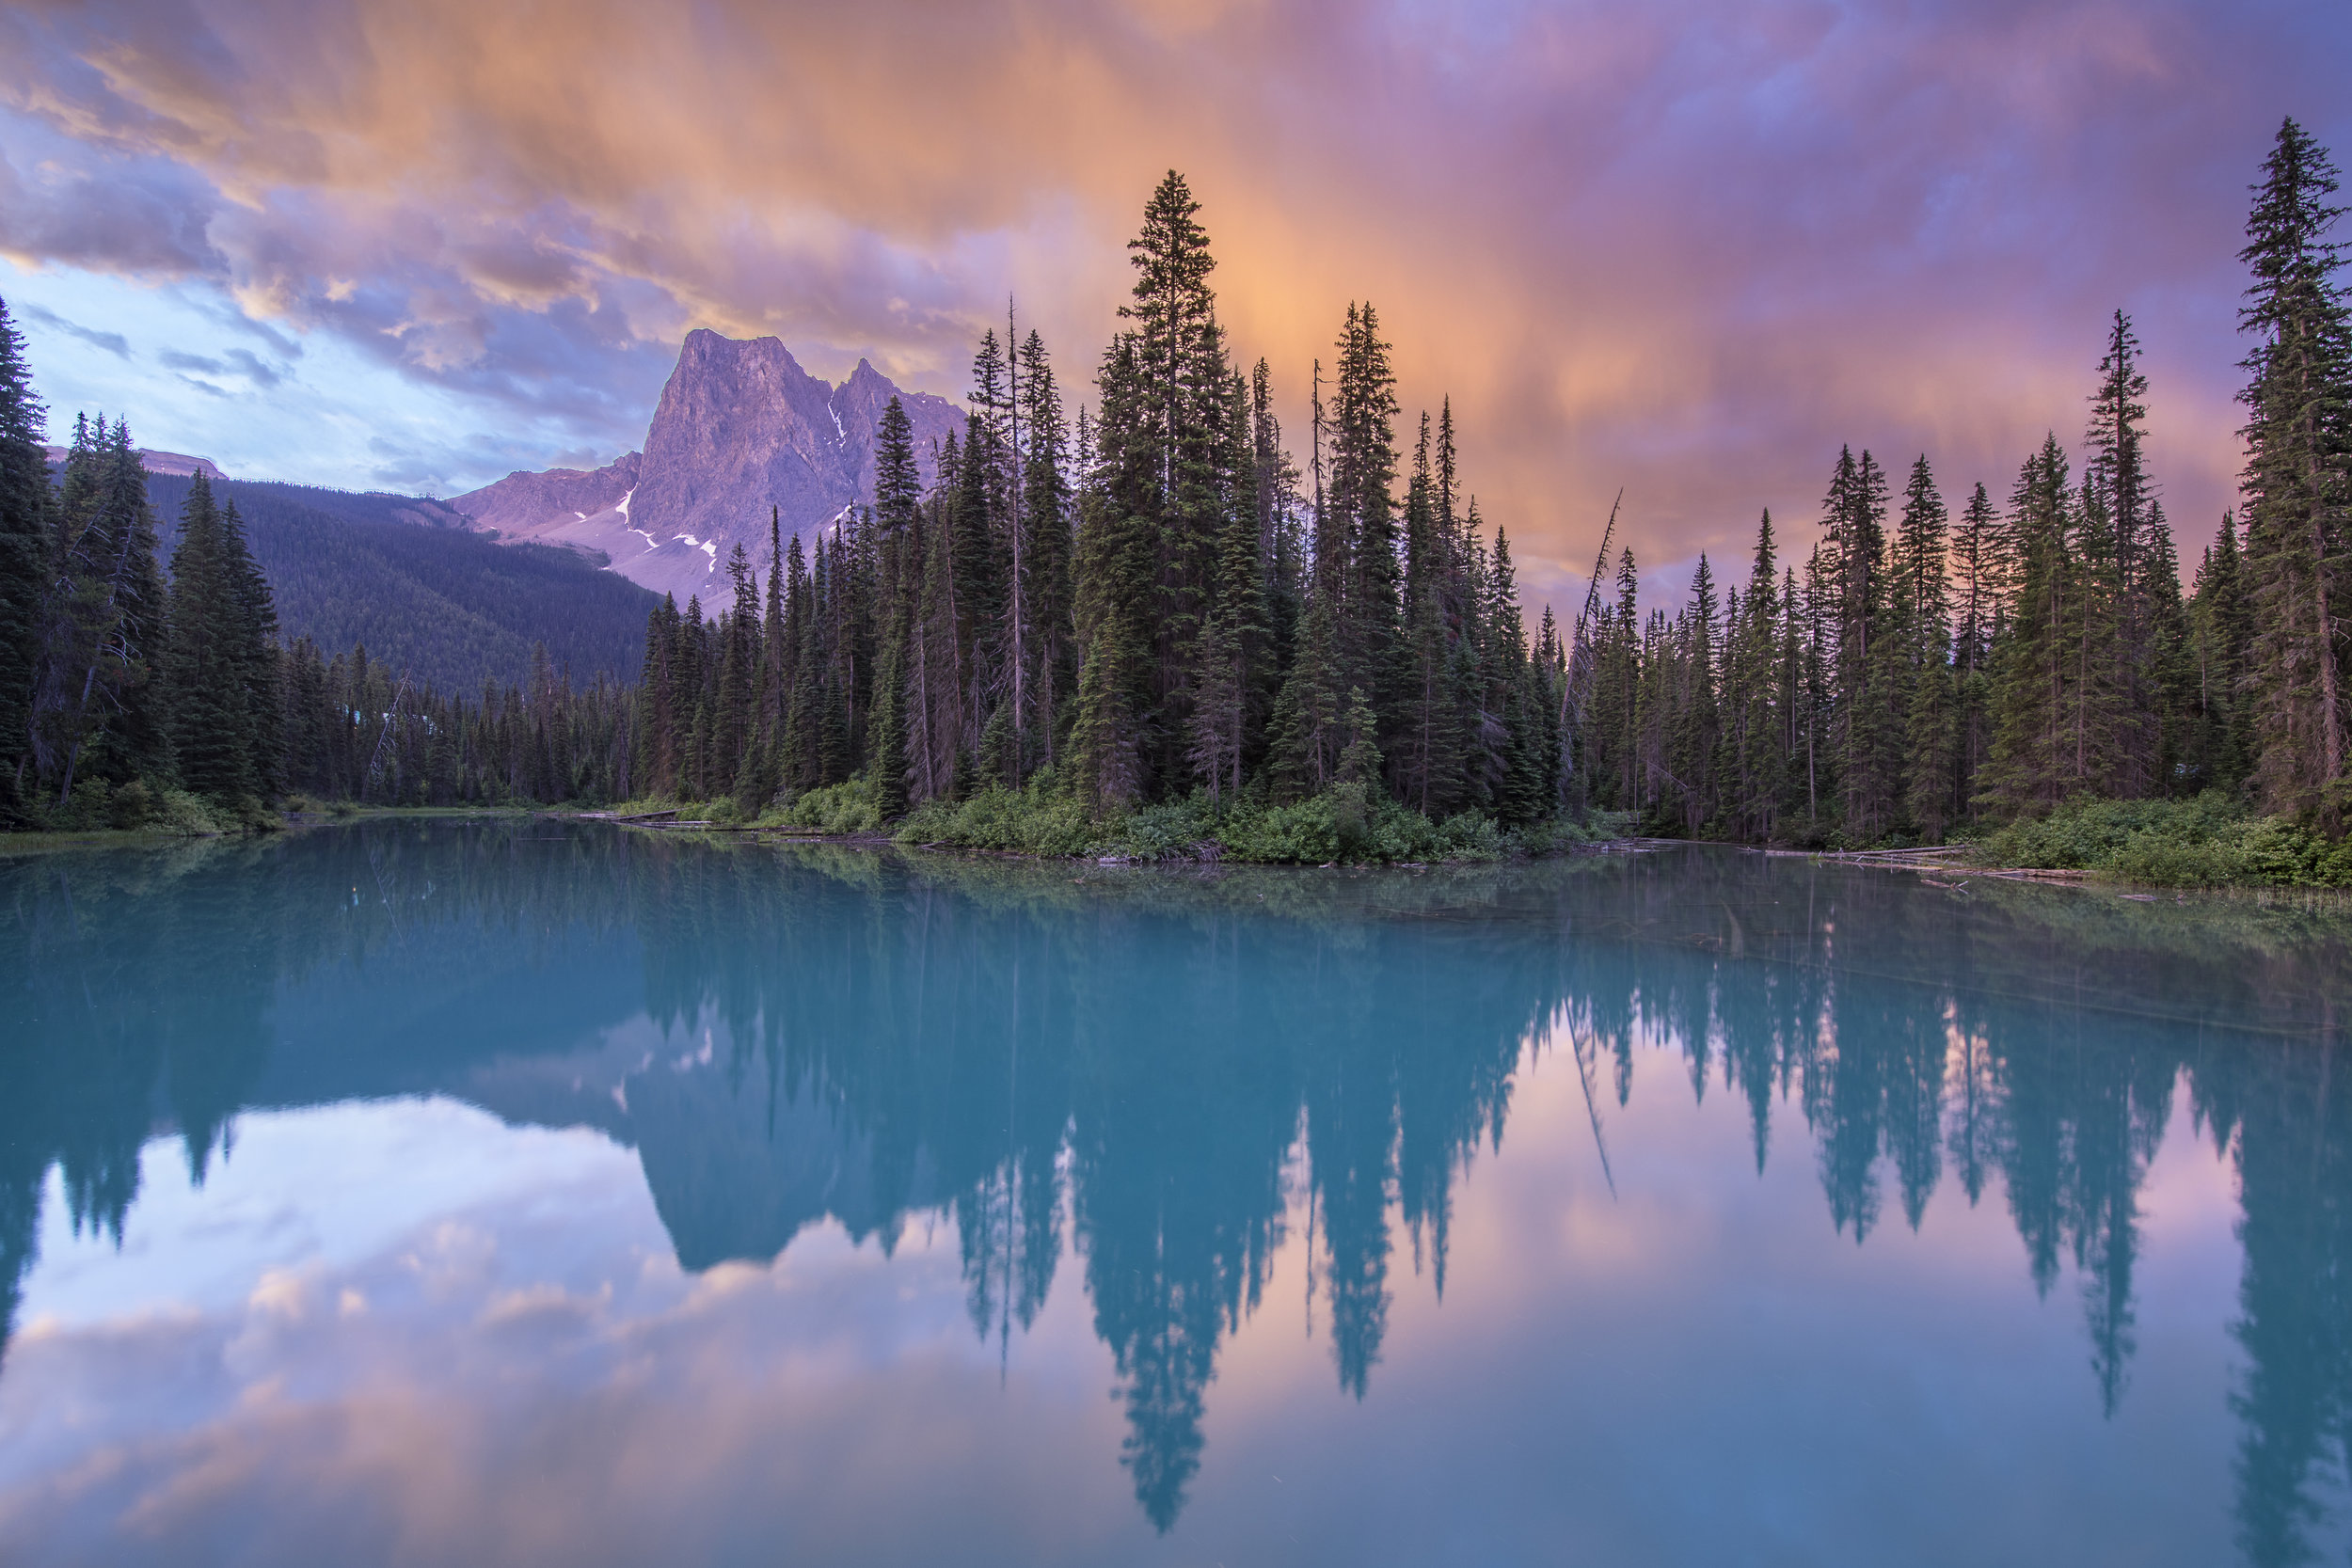 Emerald Lake, Yoho, BC, Canada